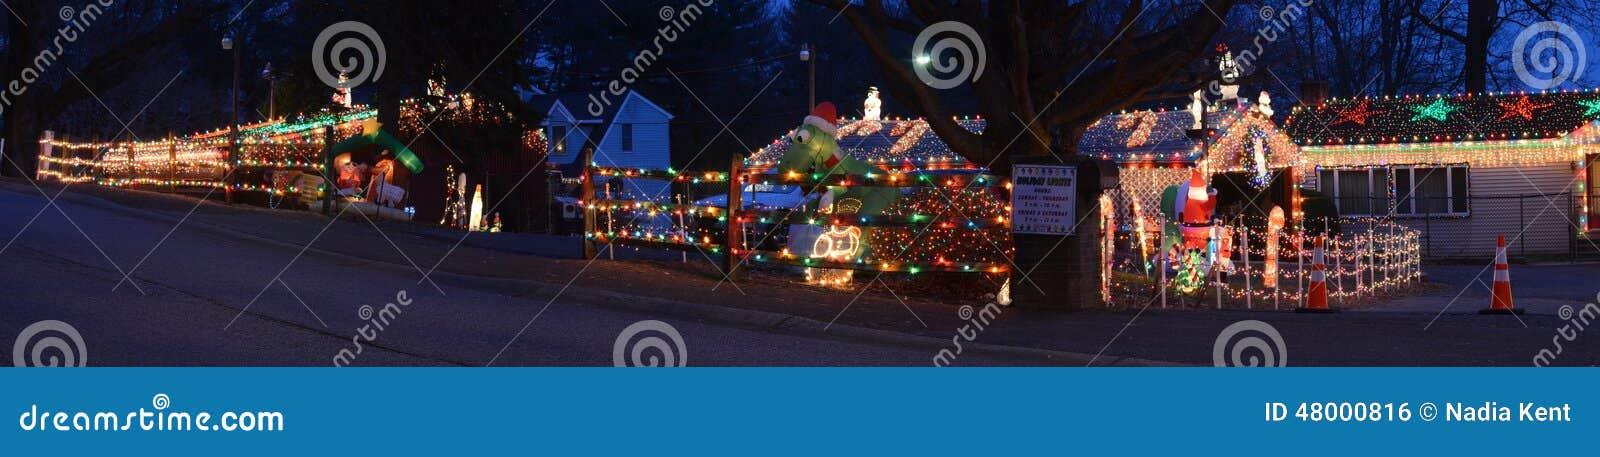 Fantasia maravilhosa das luzes de Natal